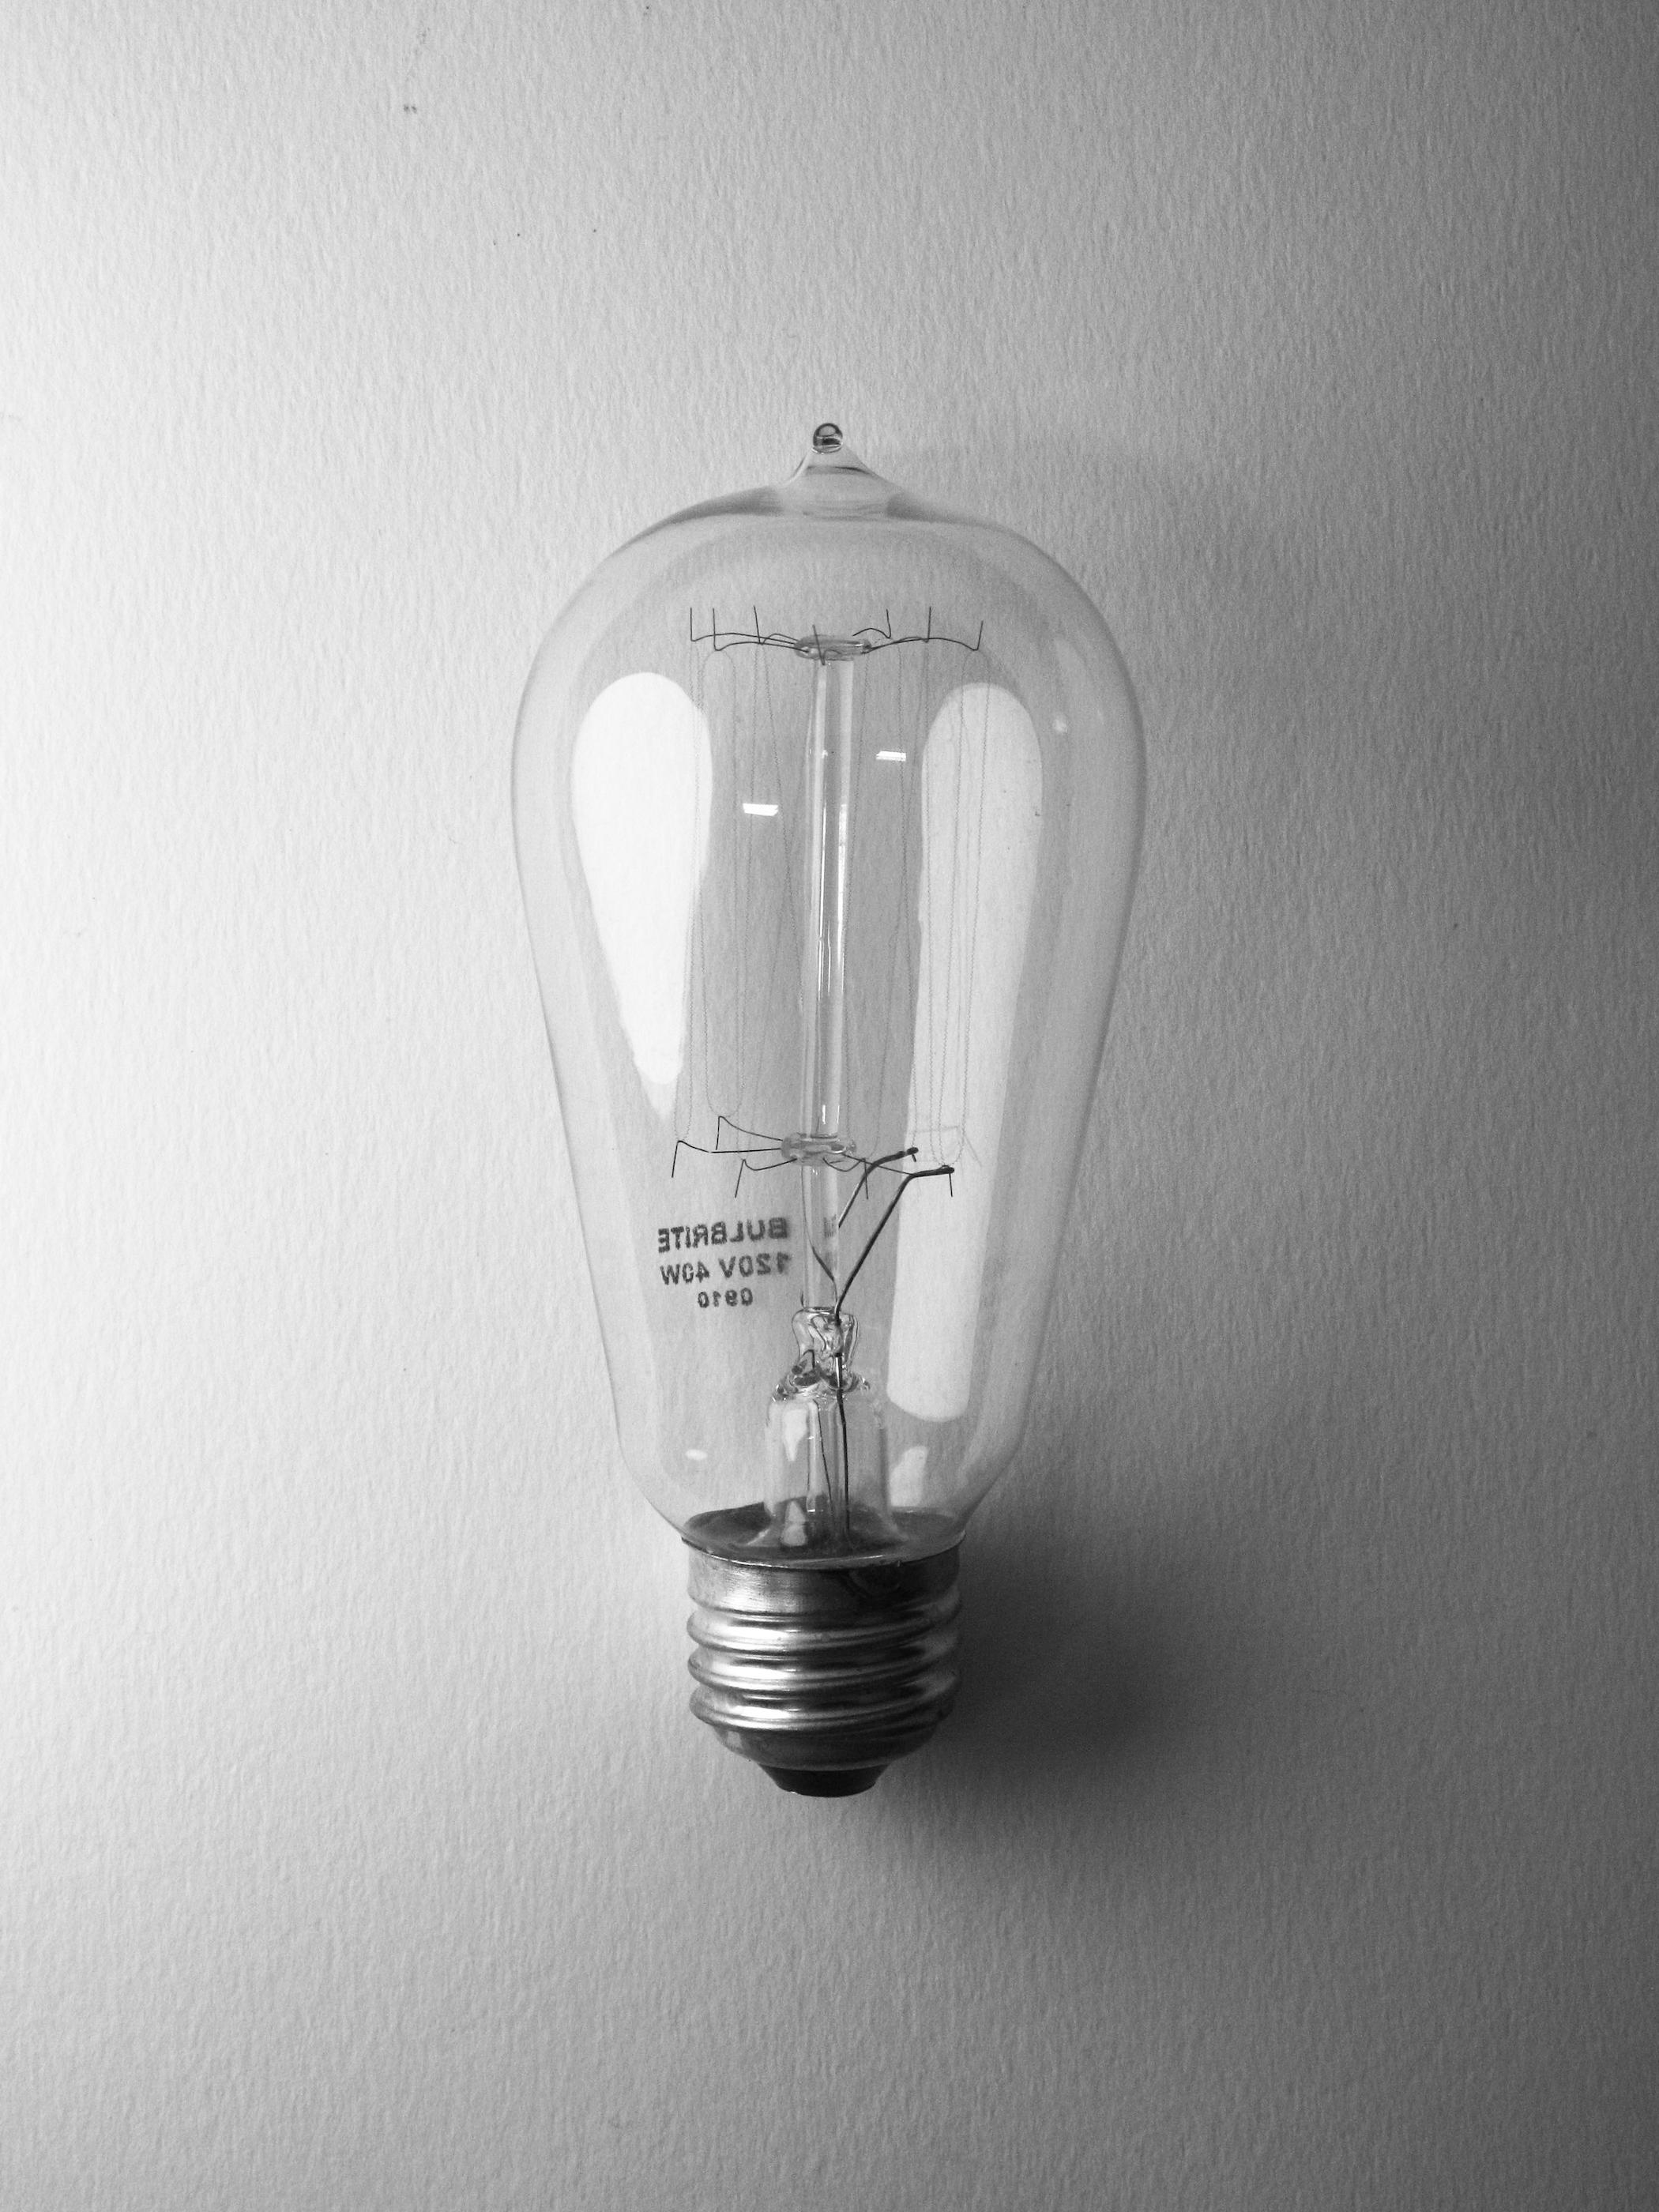 Malorie's Bulb